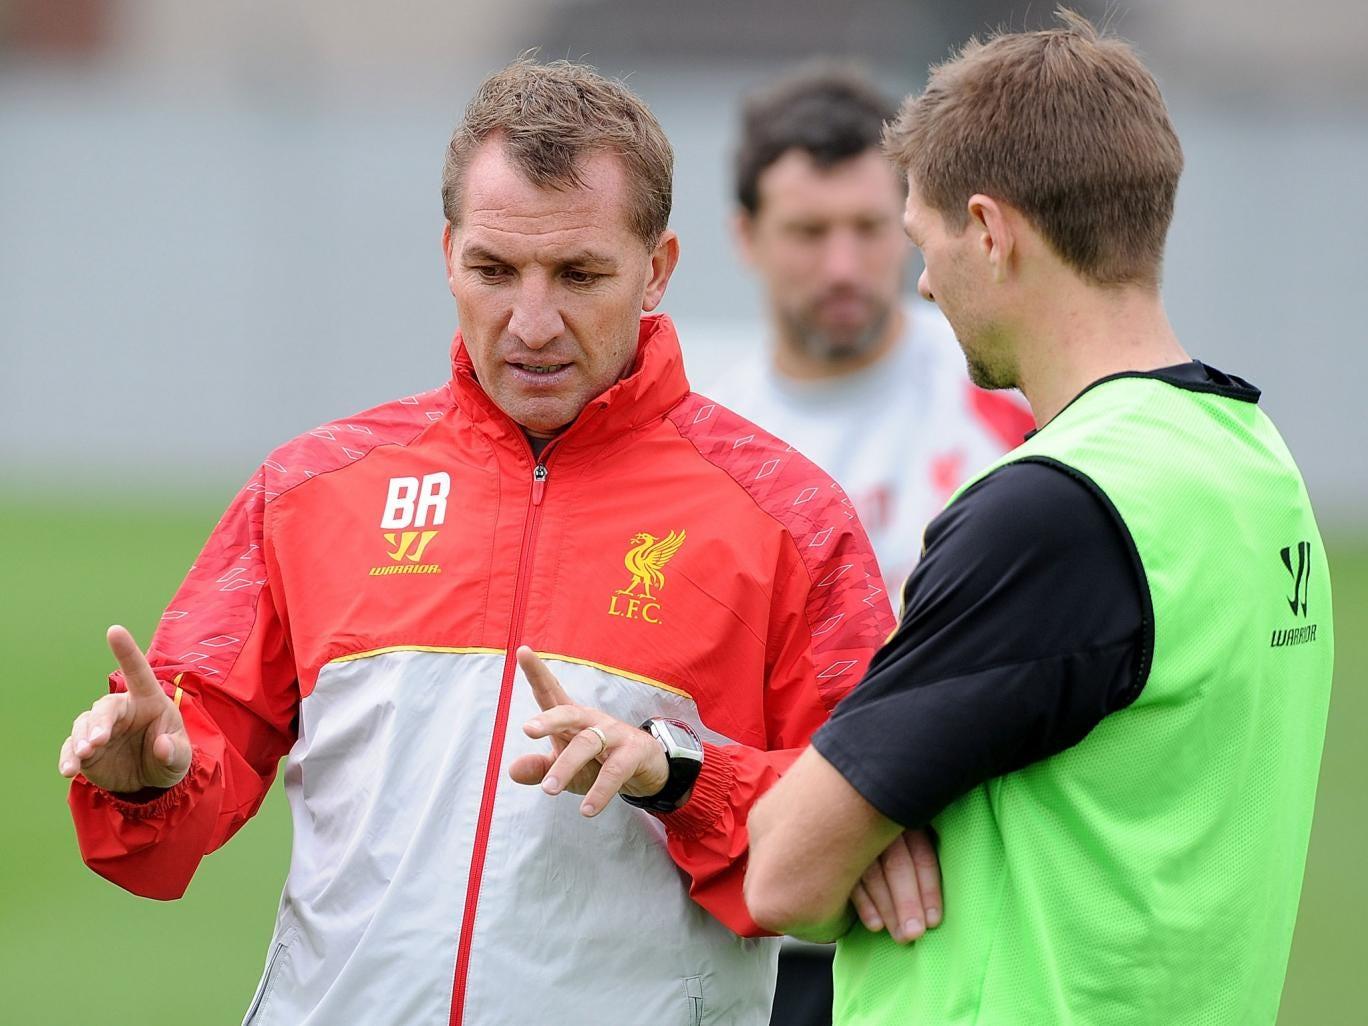 Brendan Rodgers (left) and Steven Gerrard talk tactics during Liverpool training